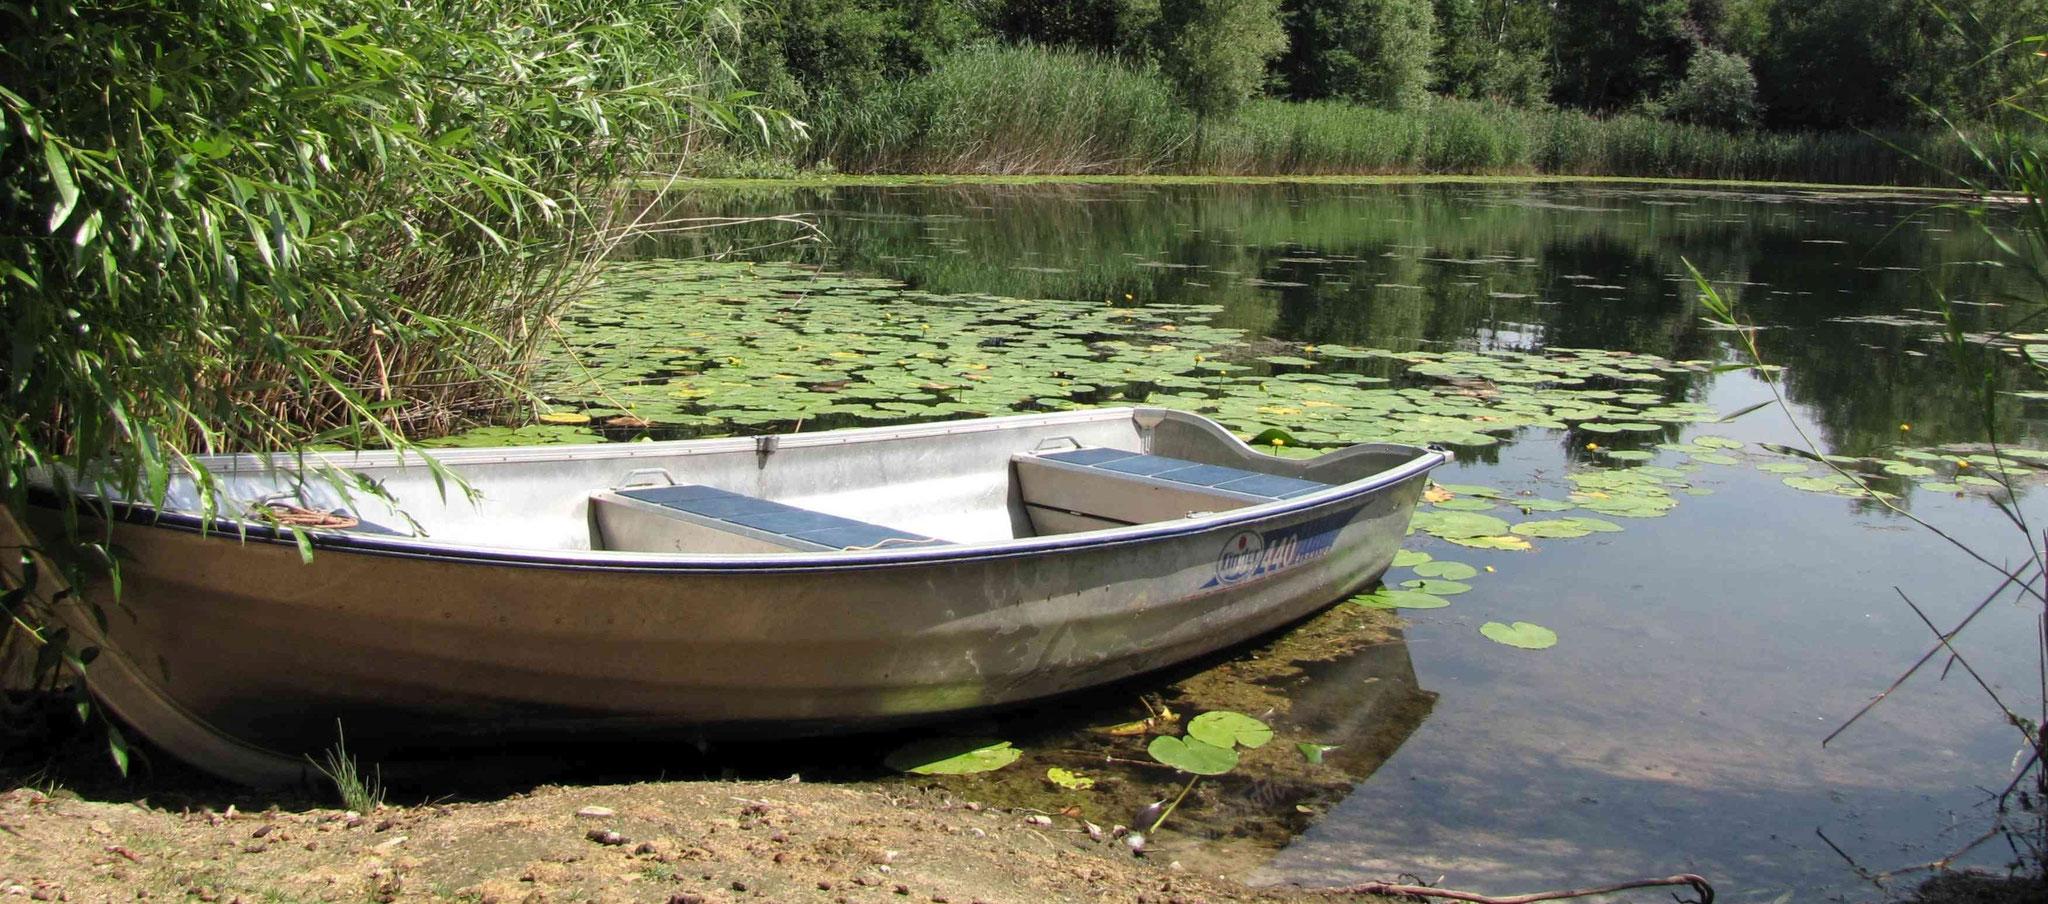 Das Ruderboot am See